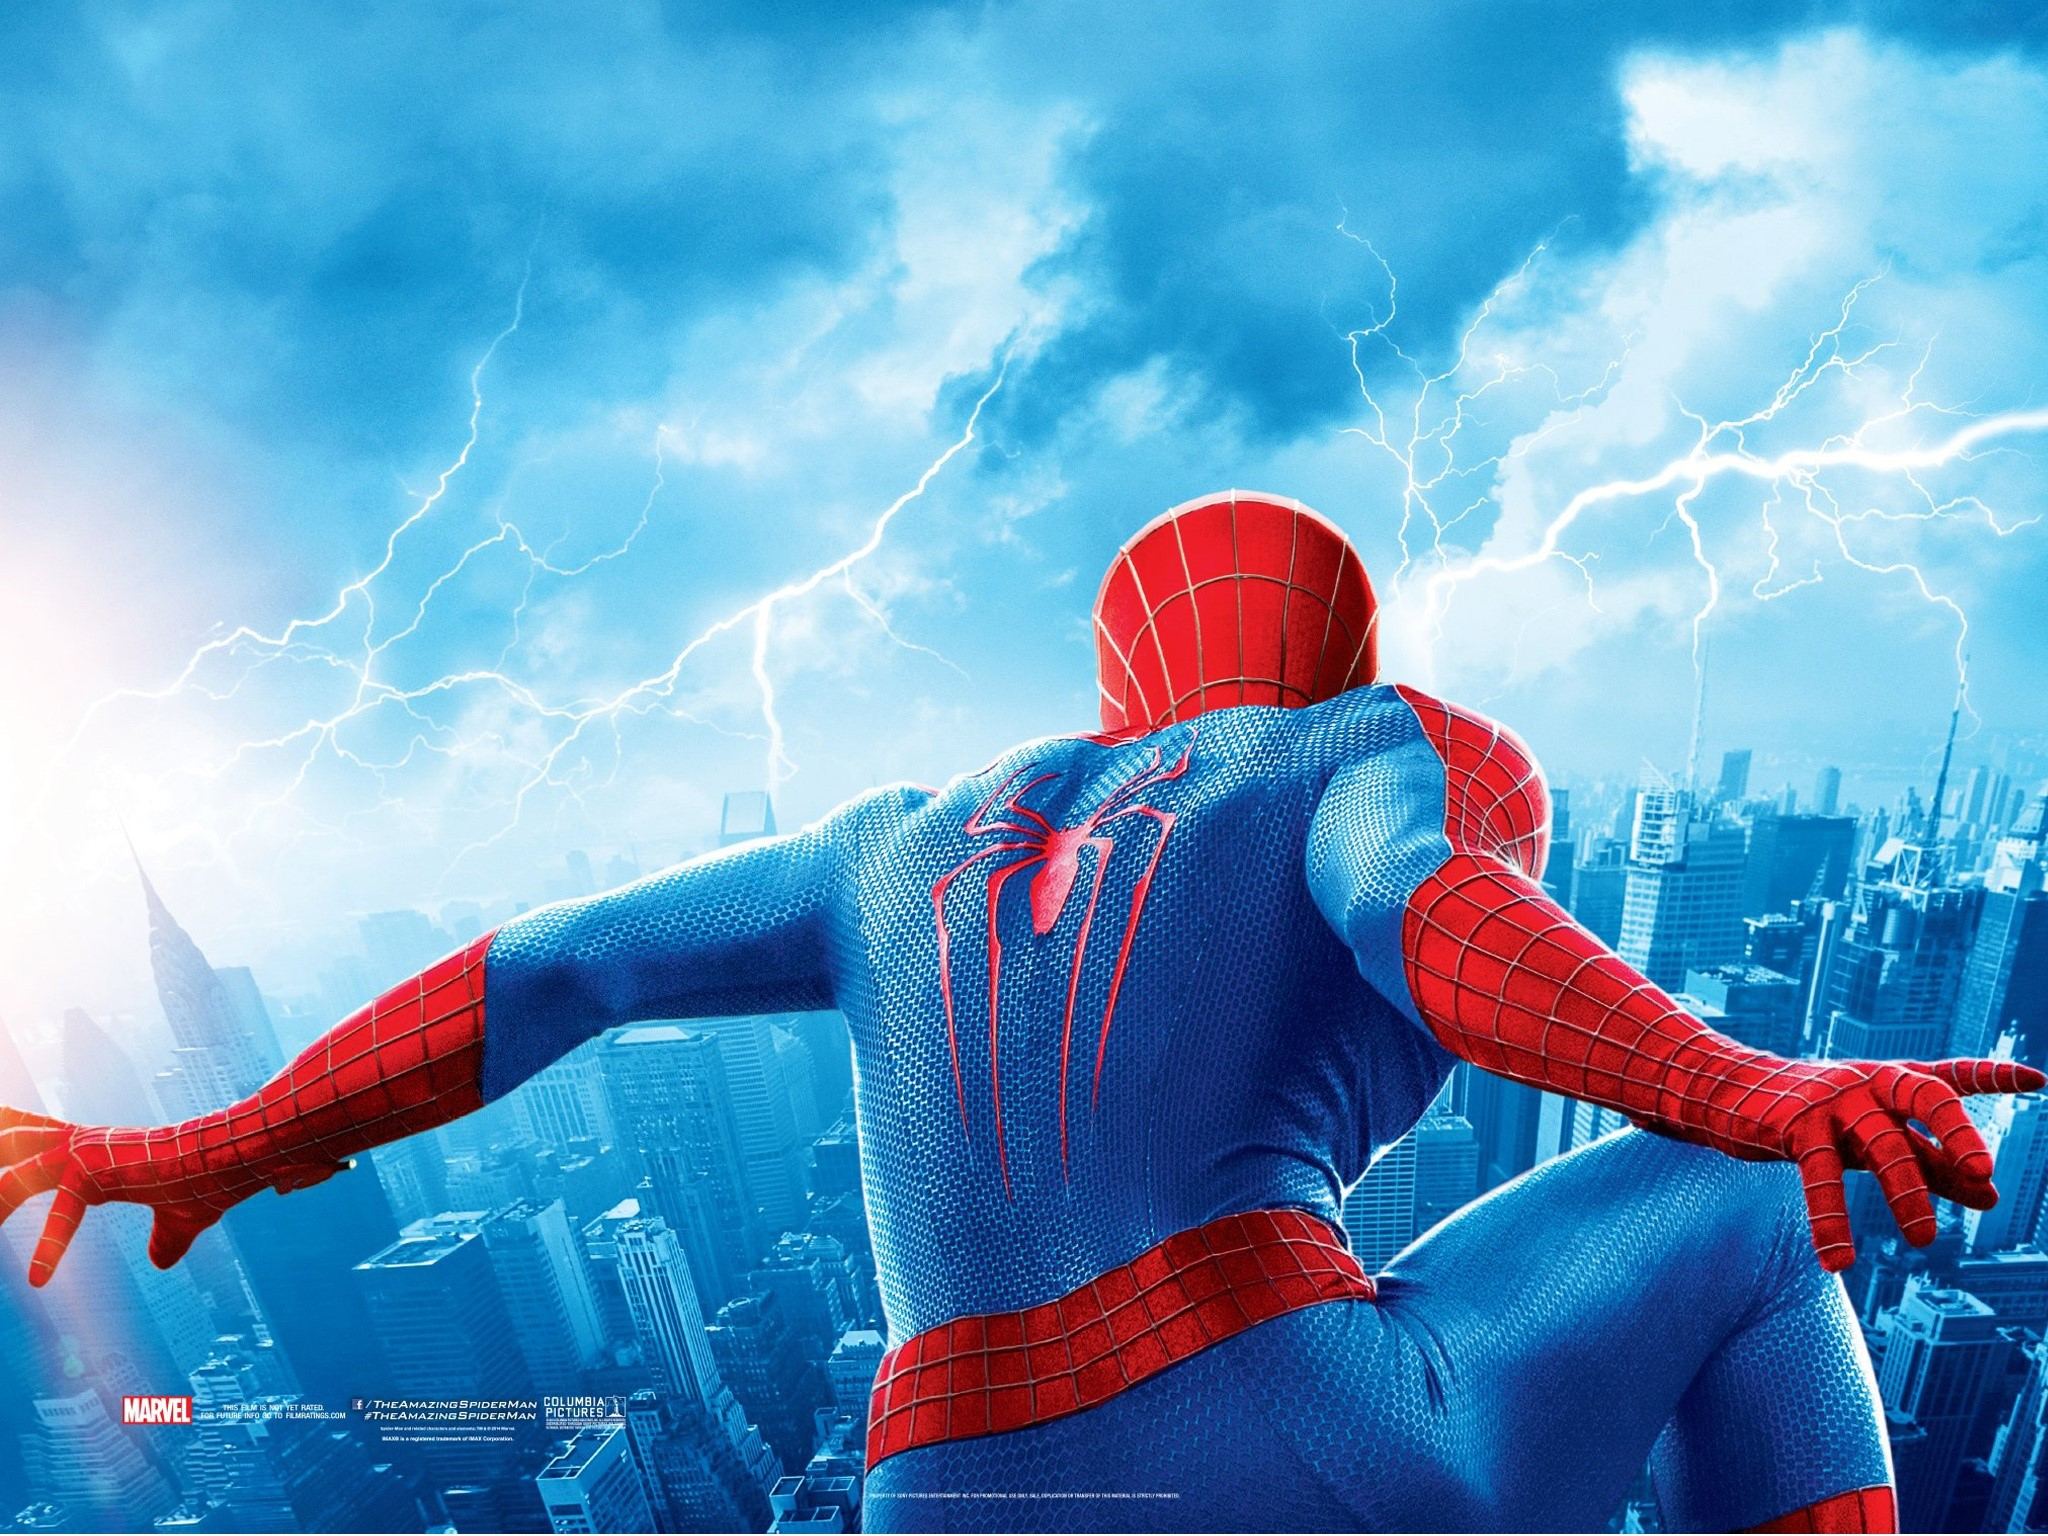 The amazing spider man 2 Fondos de pantalla 2048x1536 #316